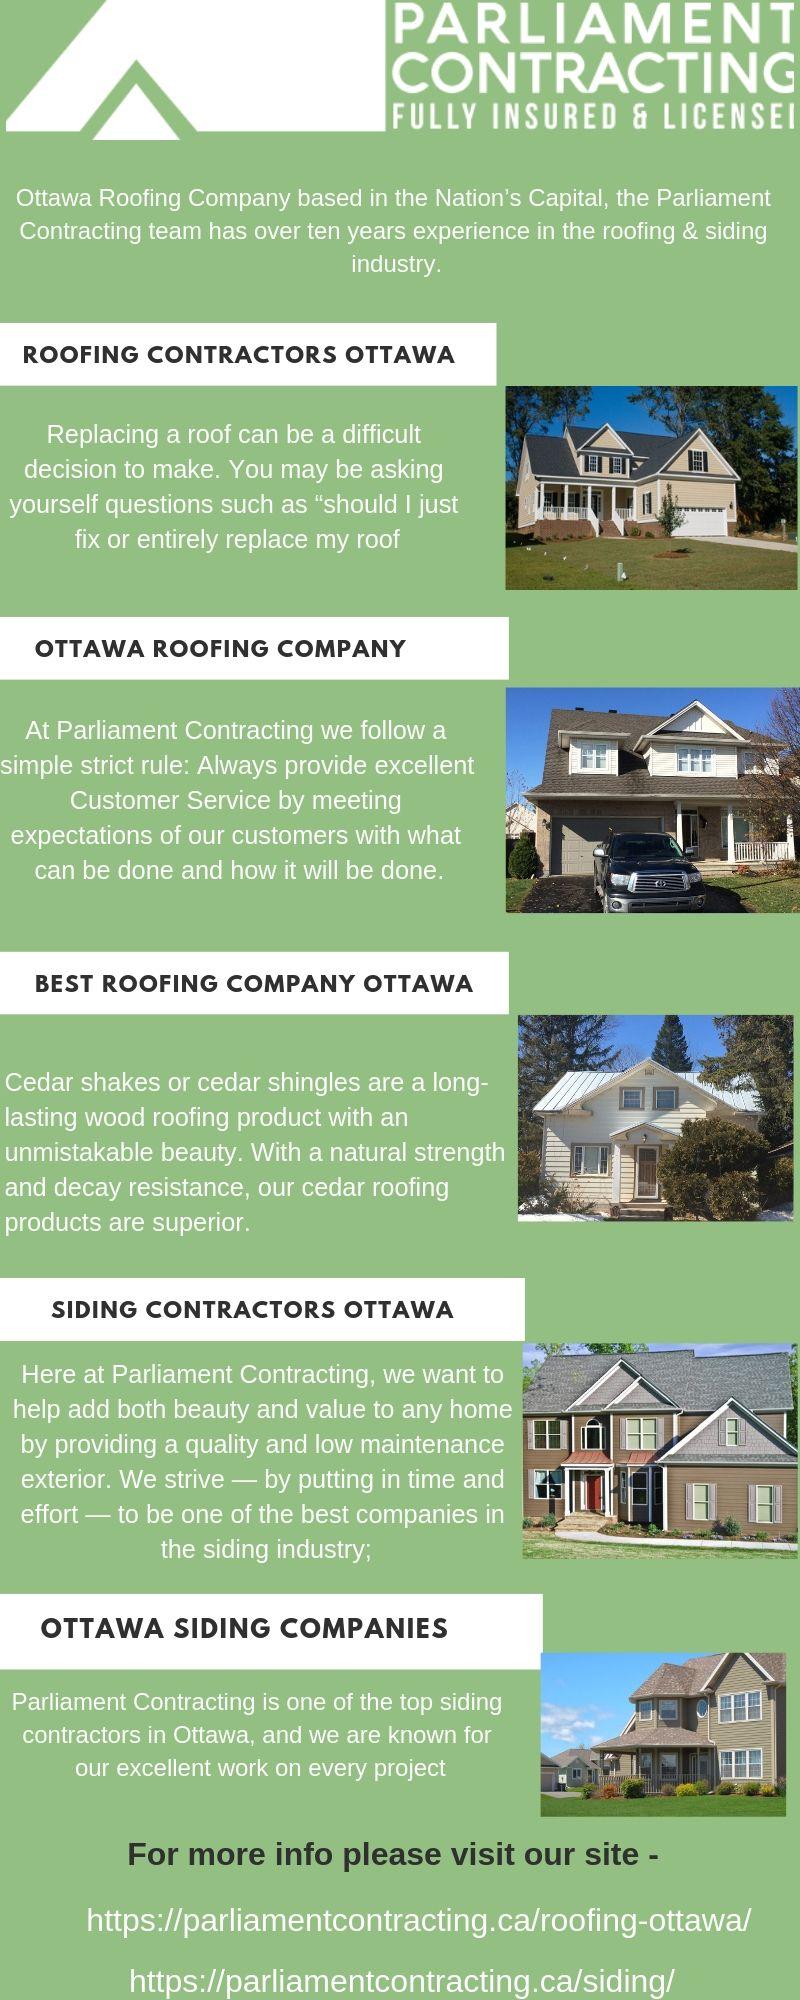 Siding Contractors Ottawa Parliament Contracting Siding Contractors Siding Roofing Contract